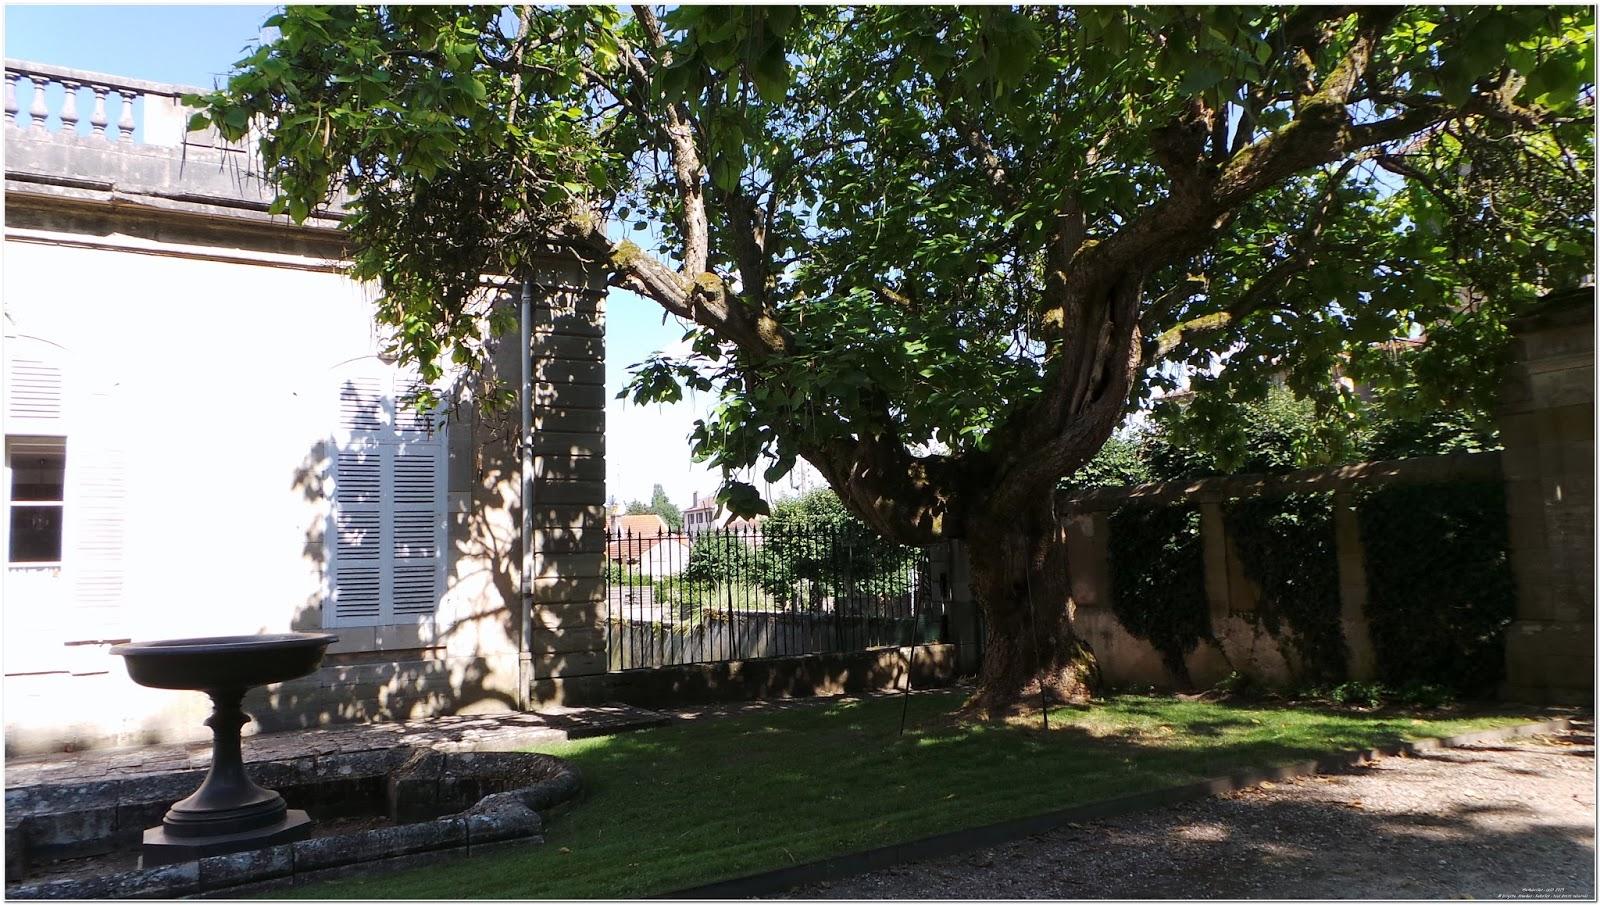 De moi vous gerbeviller jardin remarquable for Jardin remarquable 2015